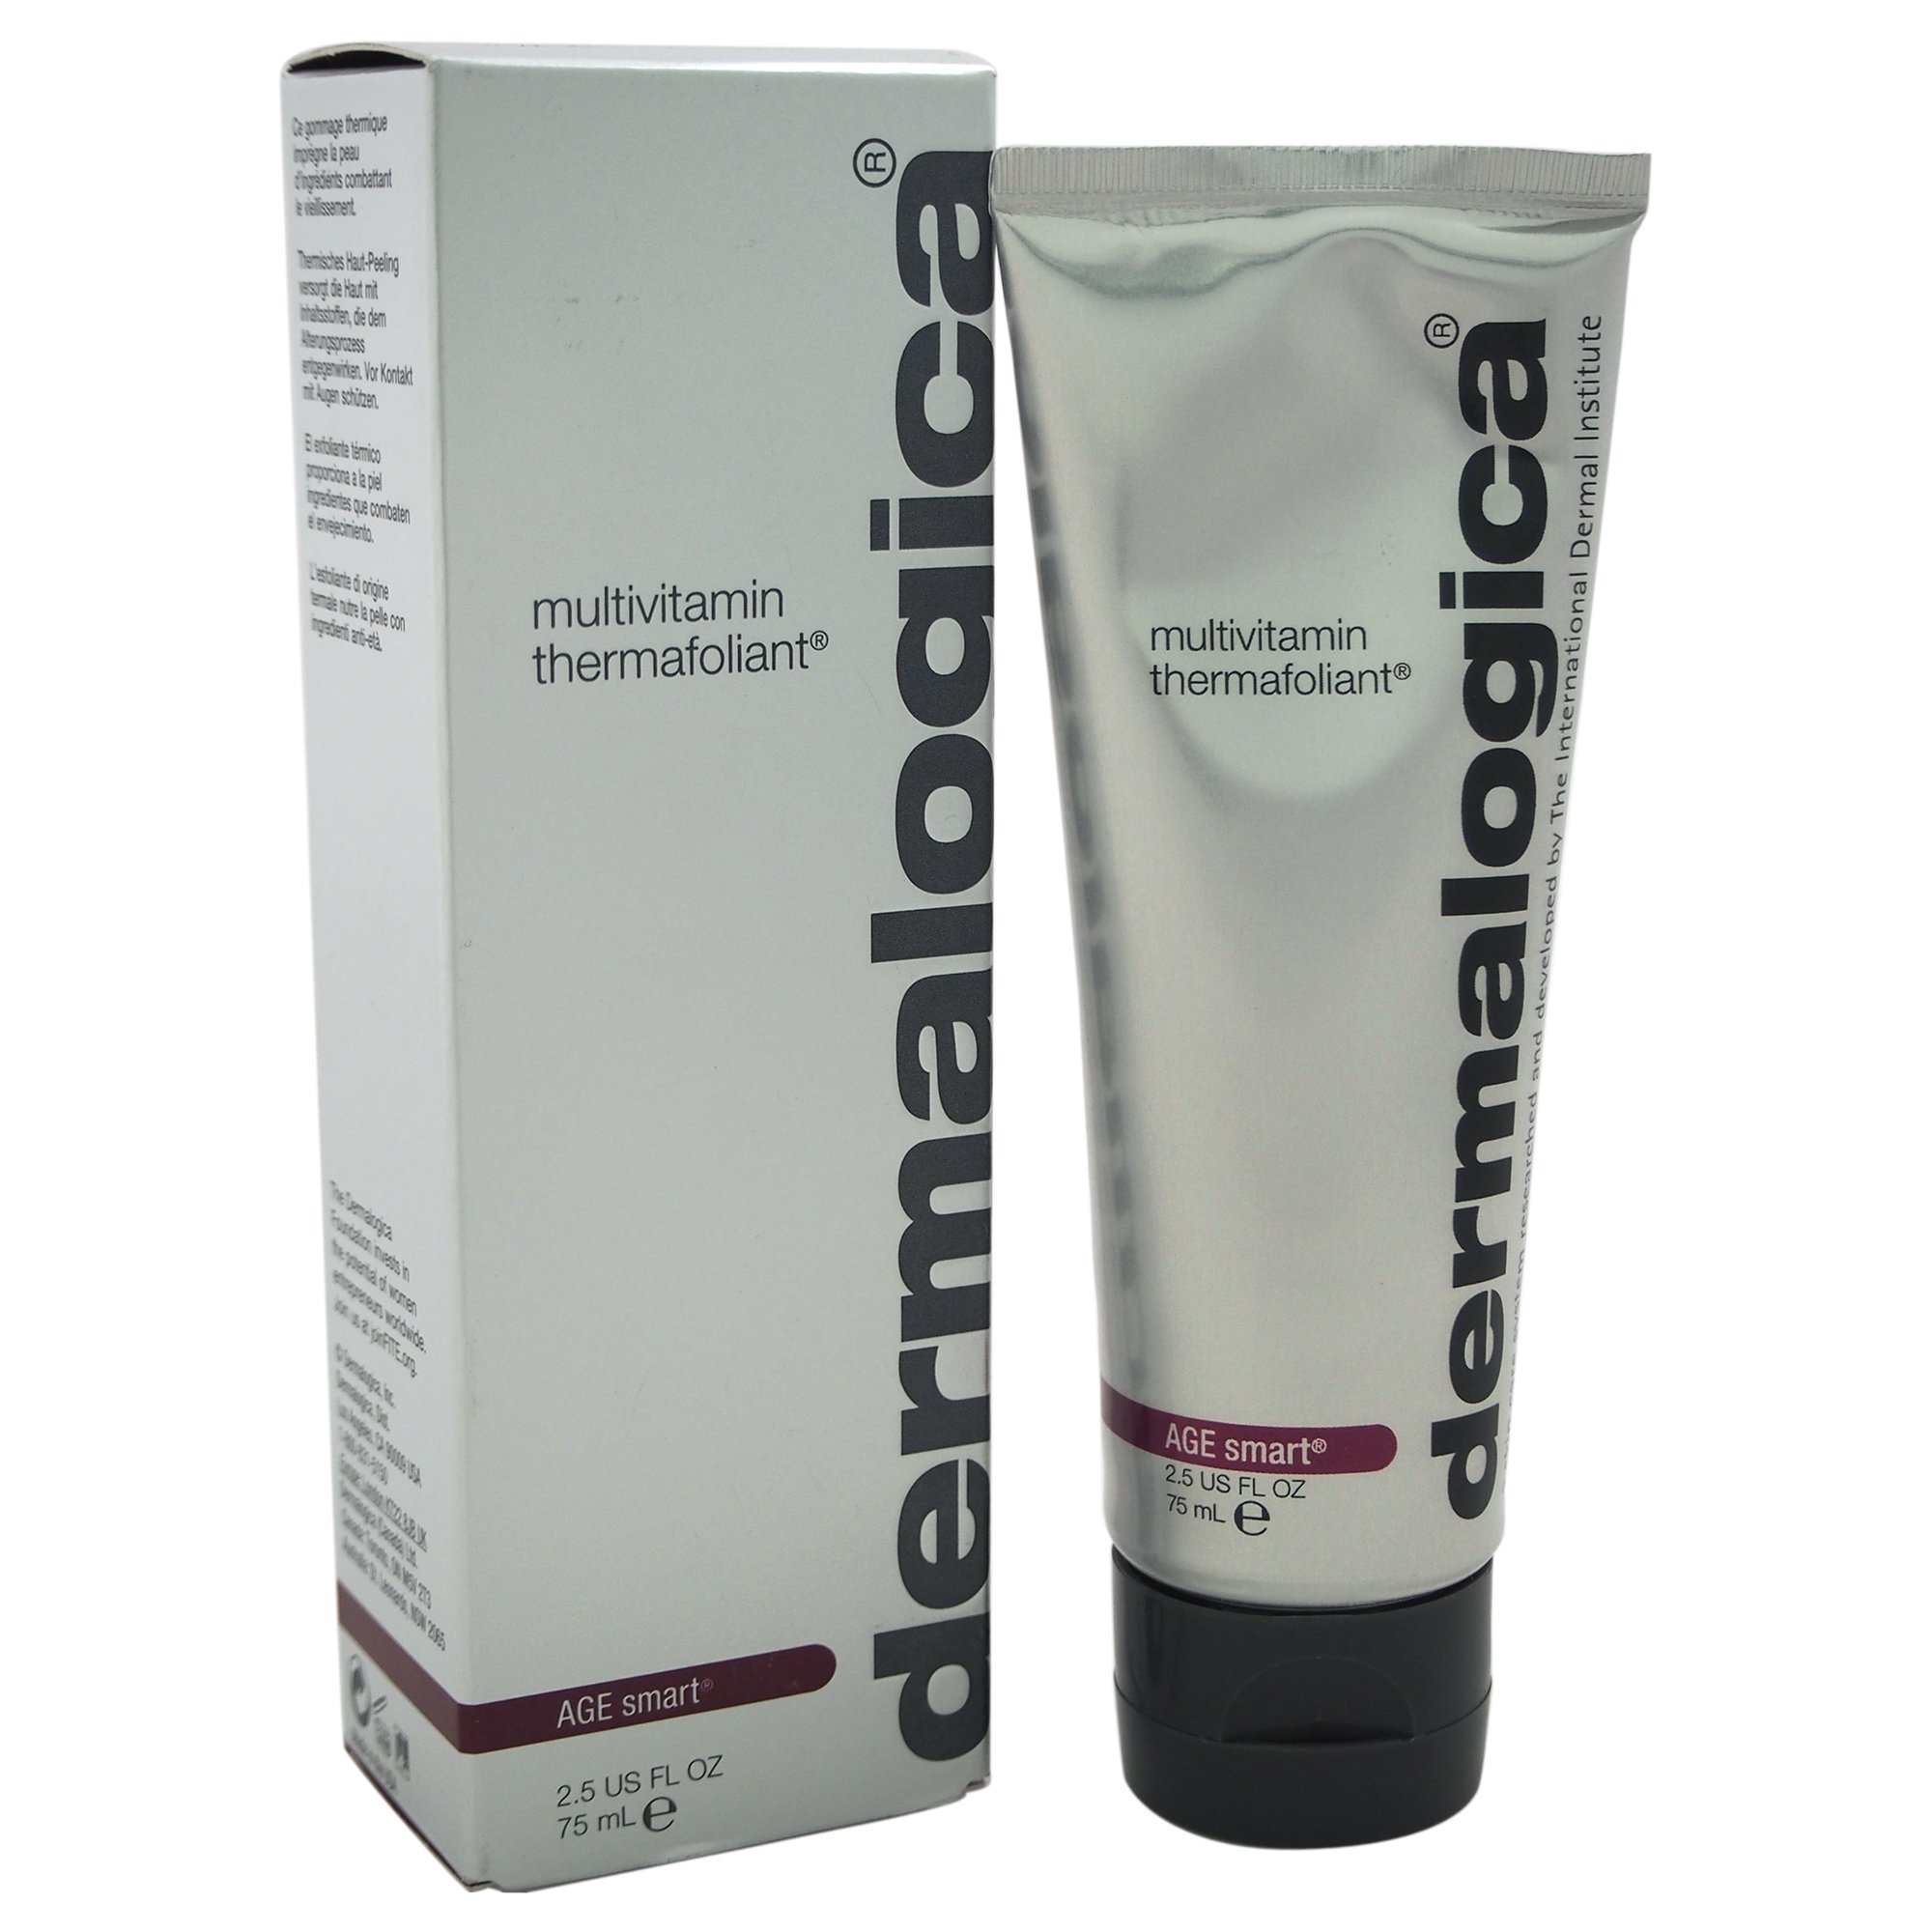 Dermalogica Multivitamin Thermafoliant, 2.5 Fluid Ounce